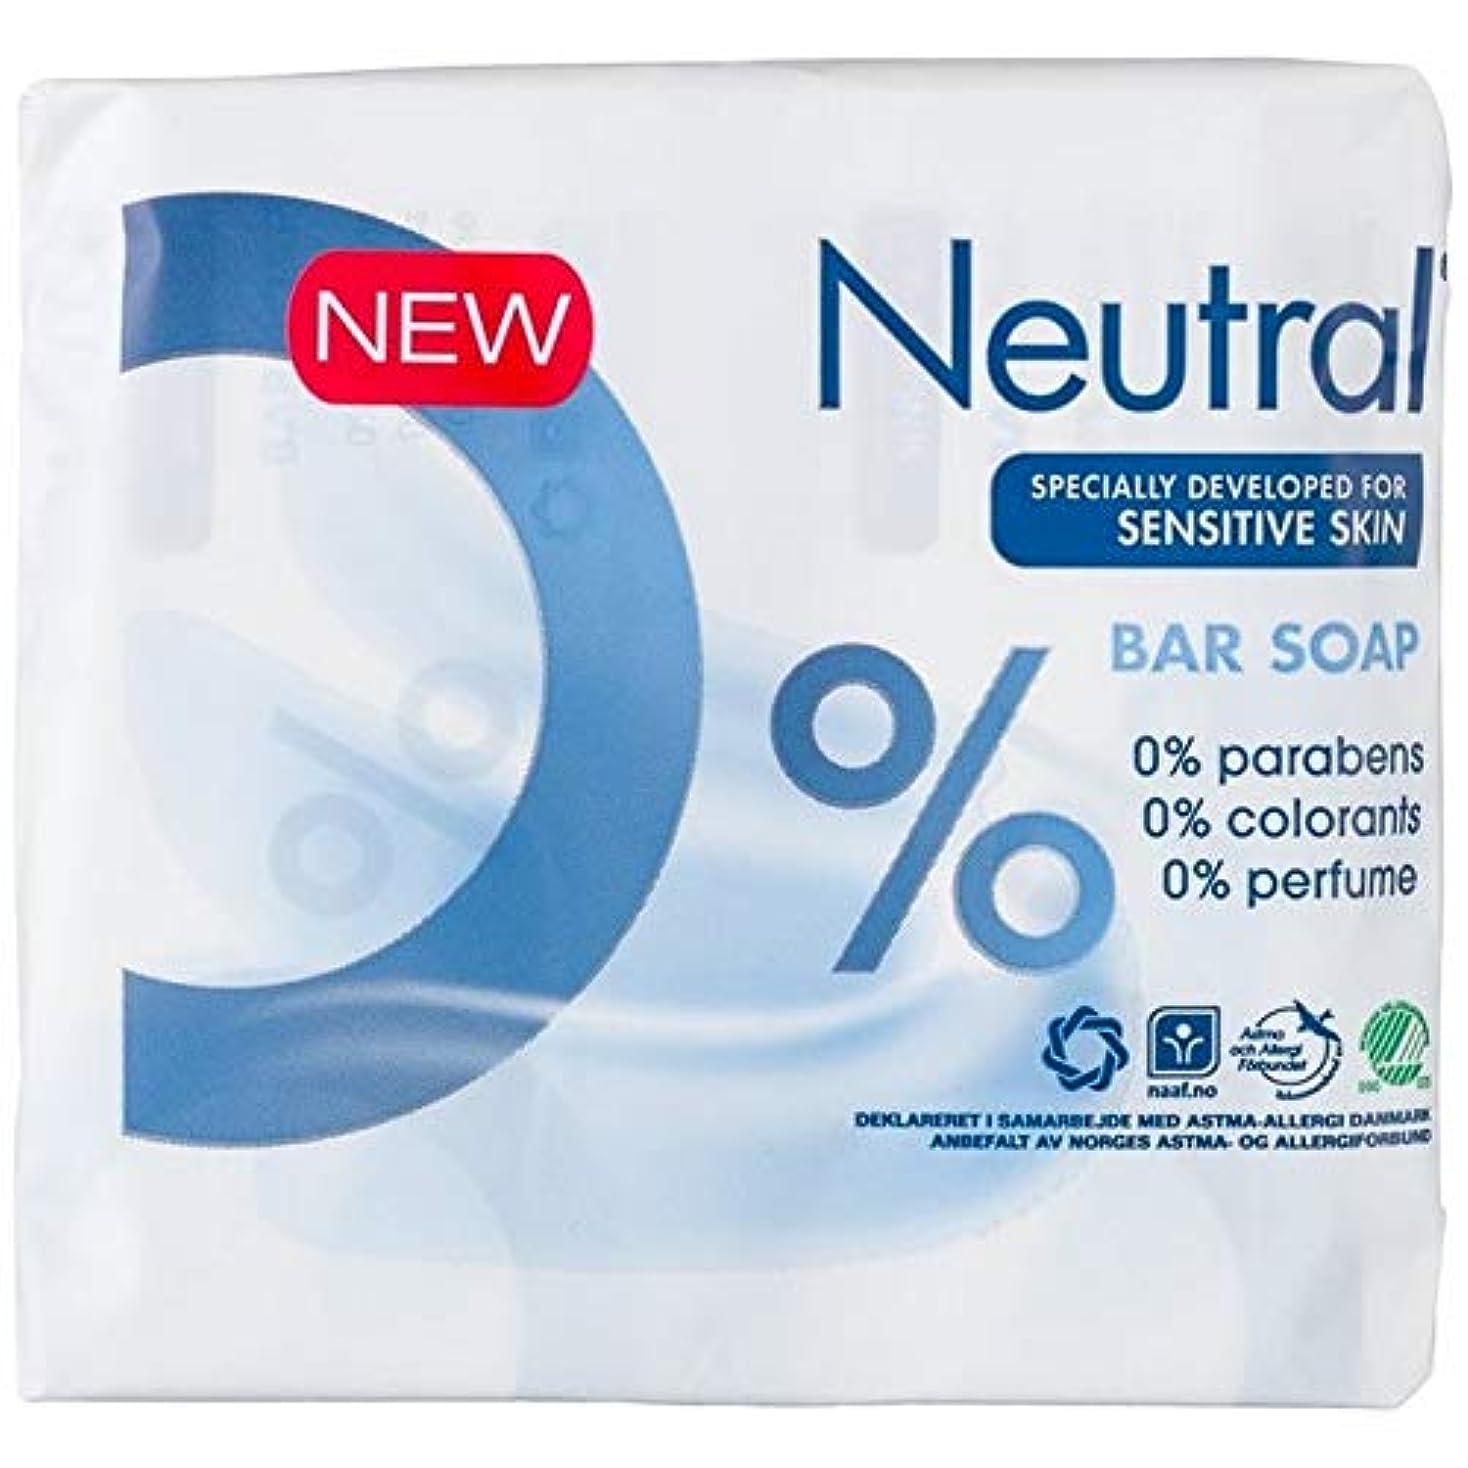 [Neutral ] ニュートラル0%の石鹸 - Neutral 0% Soap Bar [並行輸入品]